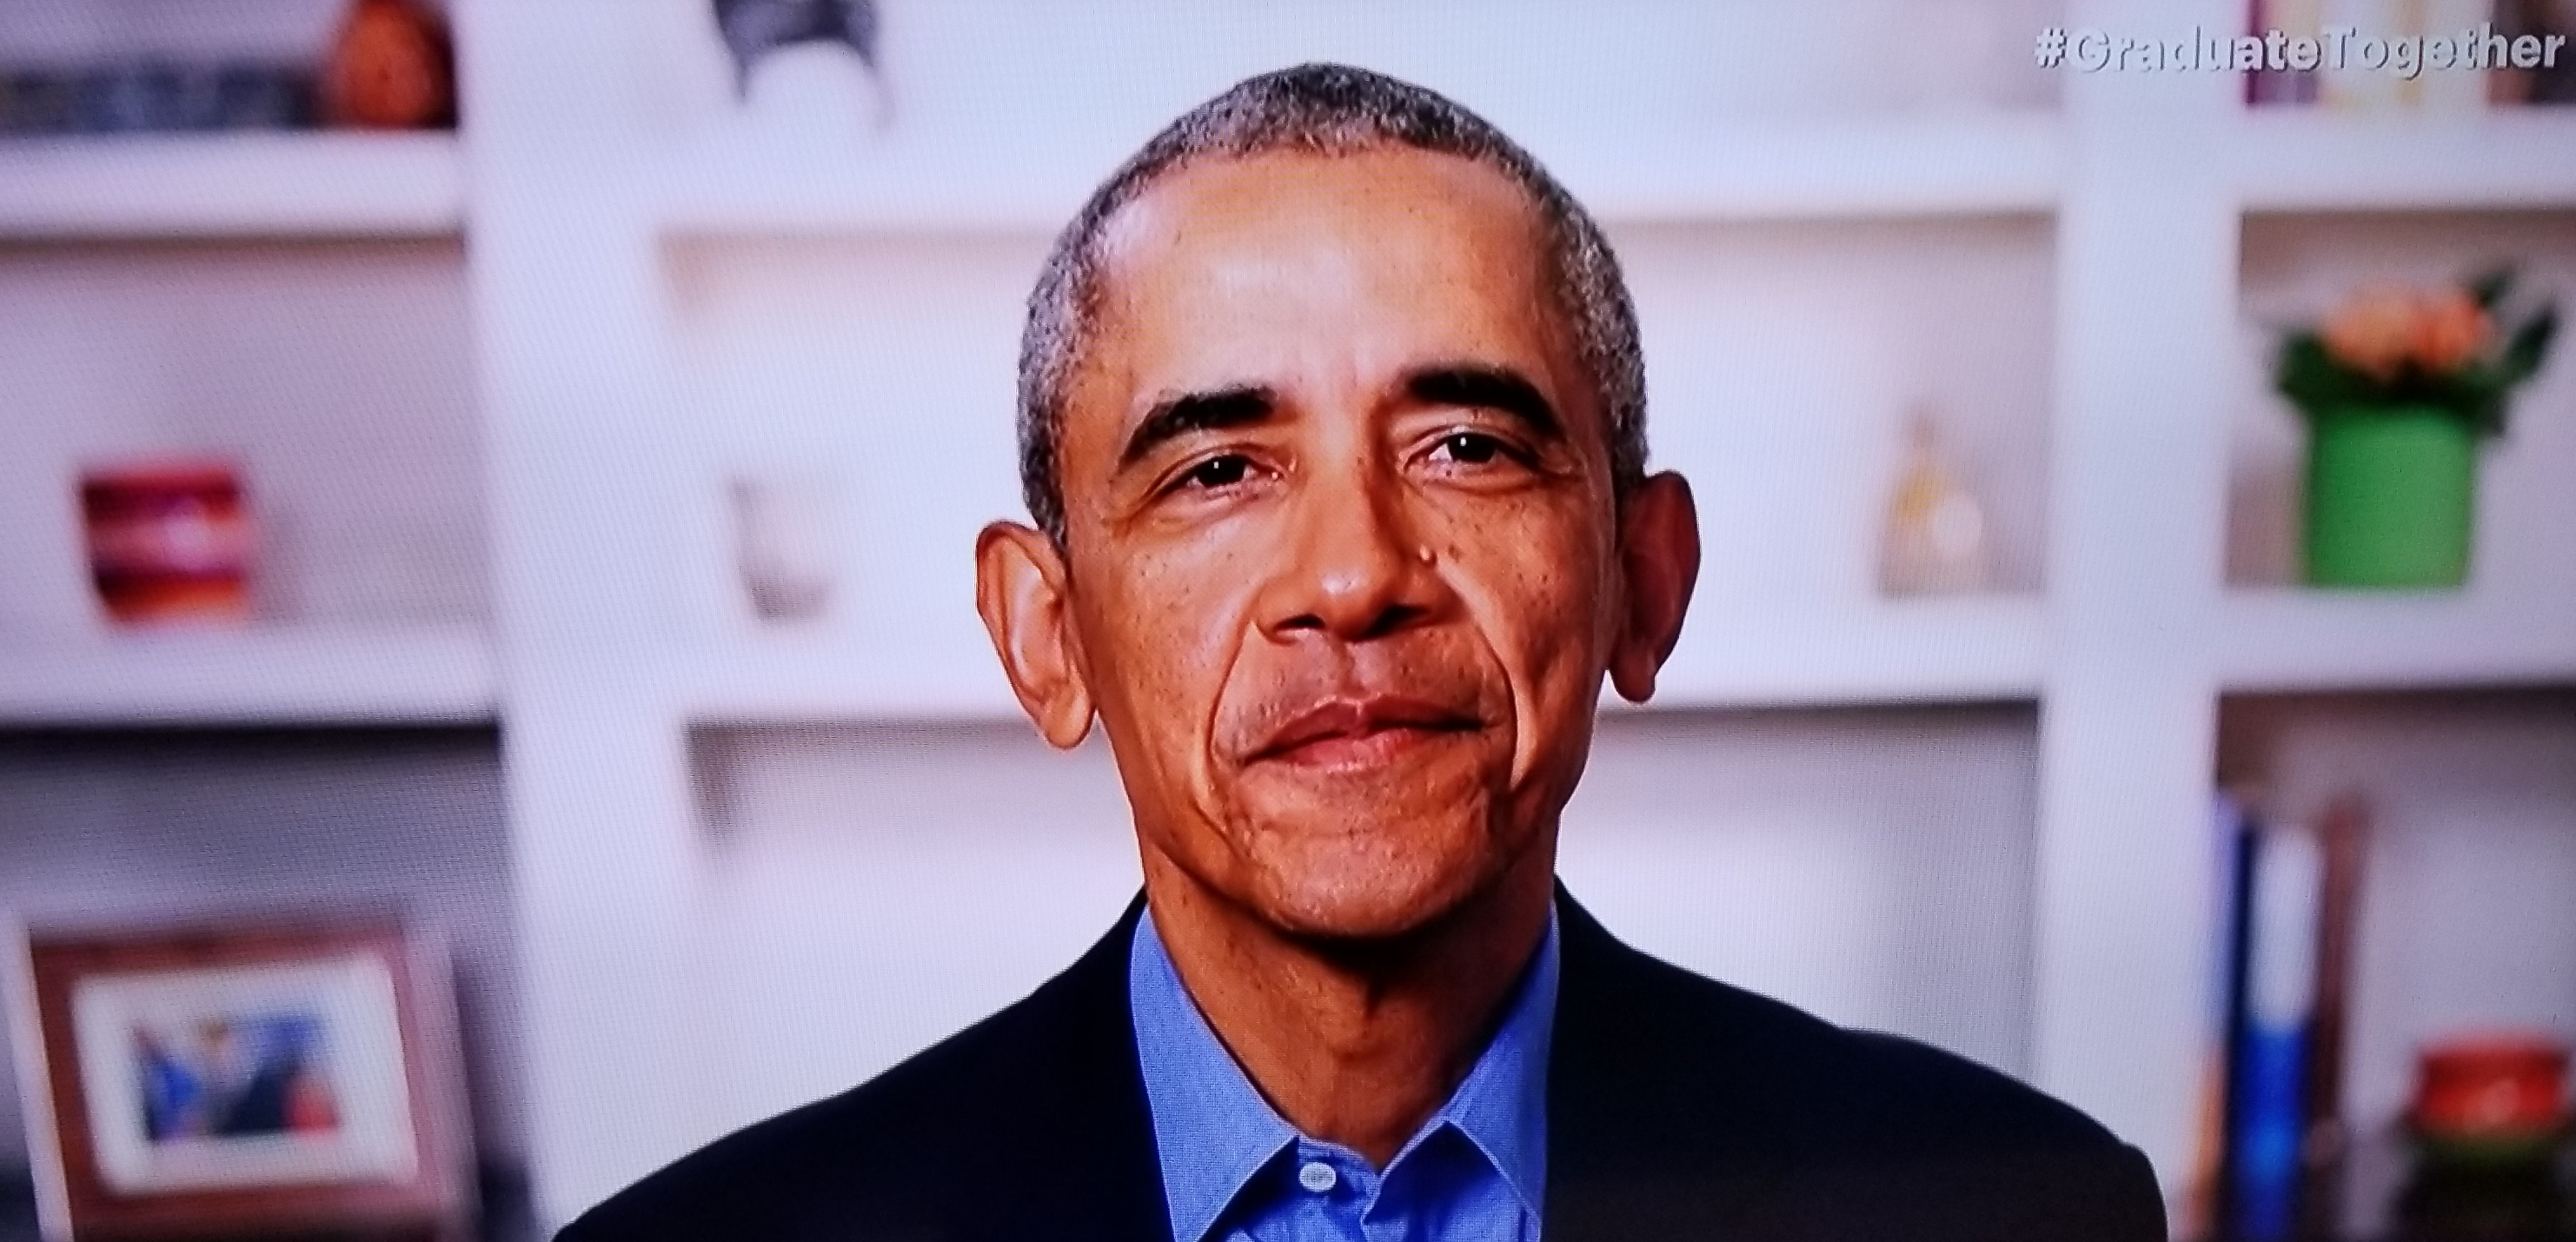 Obama Tears Trump Over Covid 19 Response In Graduate Together Speech Deadline